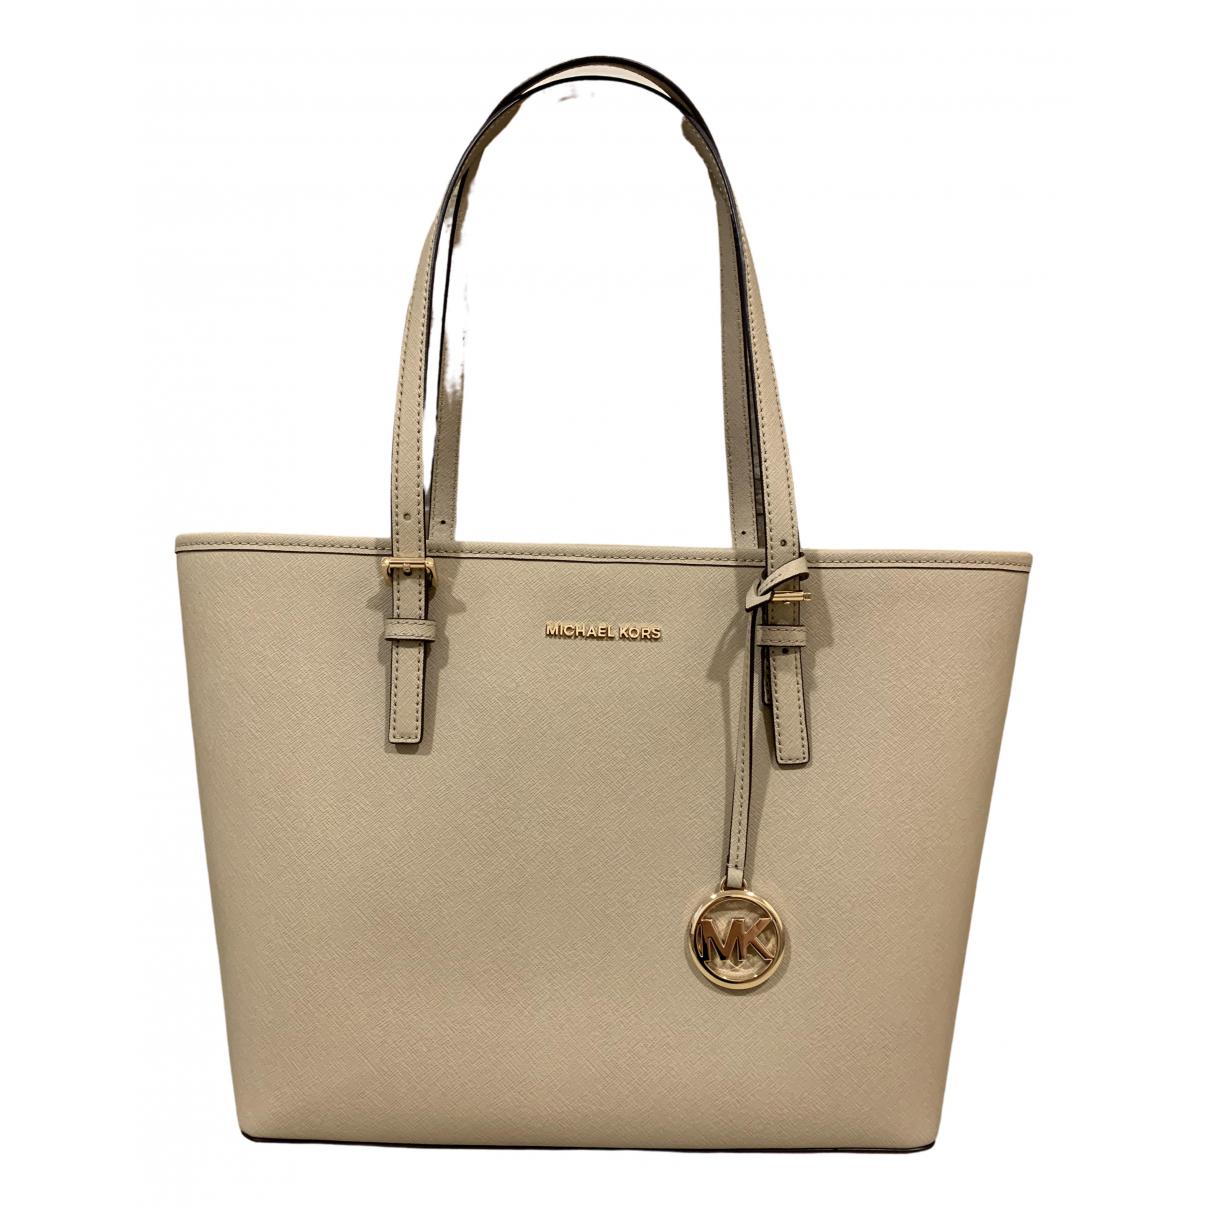 Michael Kors Jet Set Beige Leather handbag for Women \N